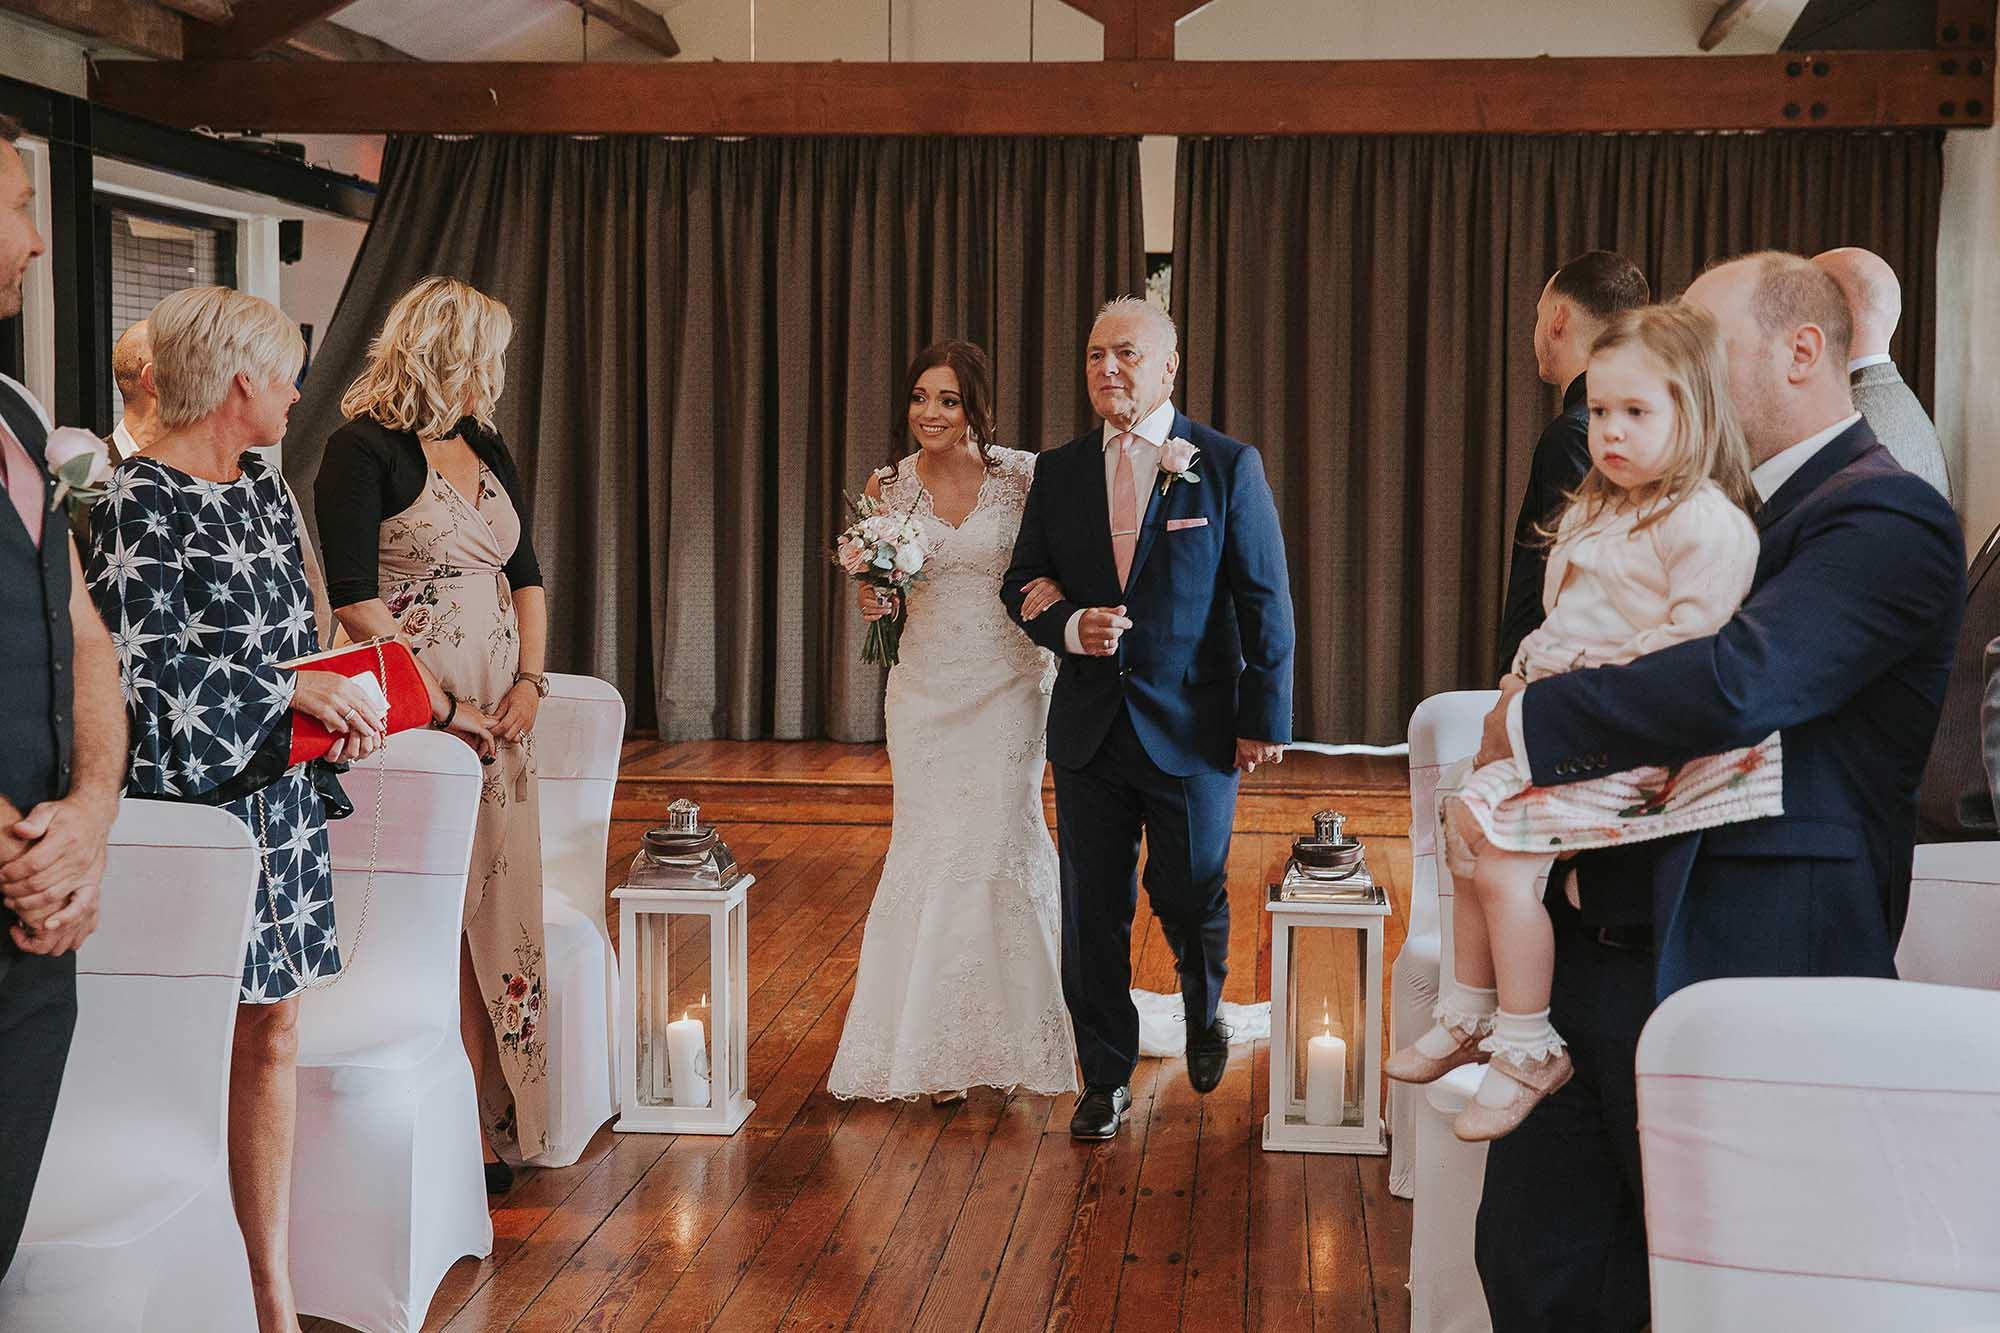 The Castlefield Rooms wedding ceremony